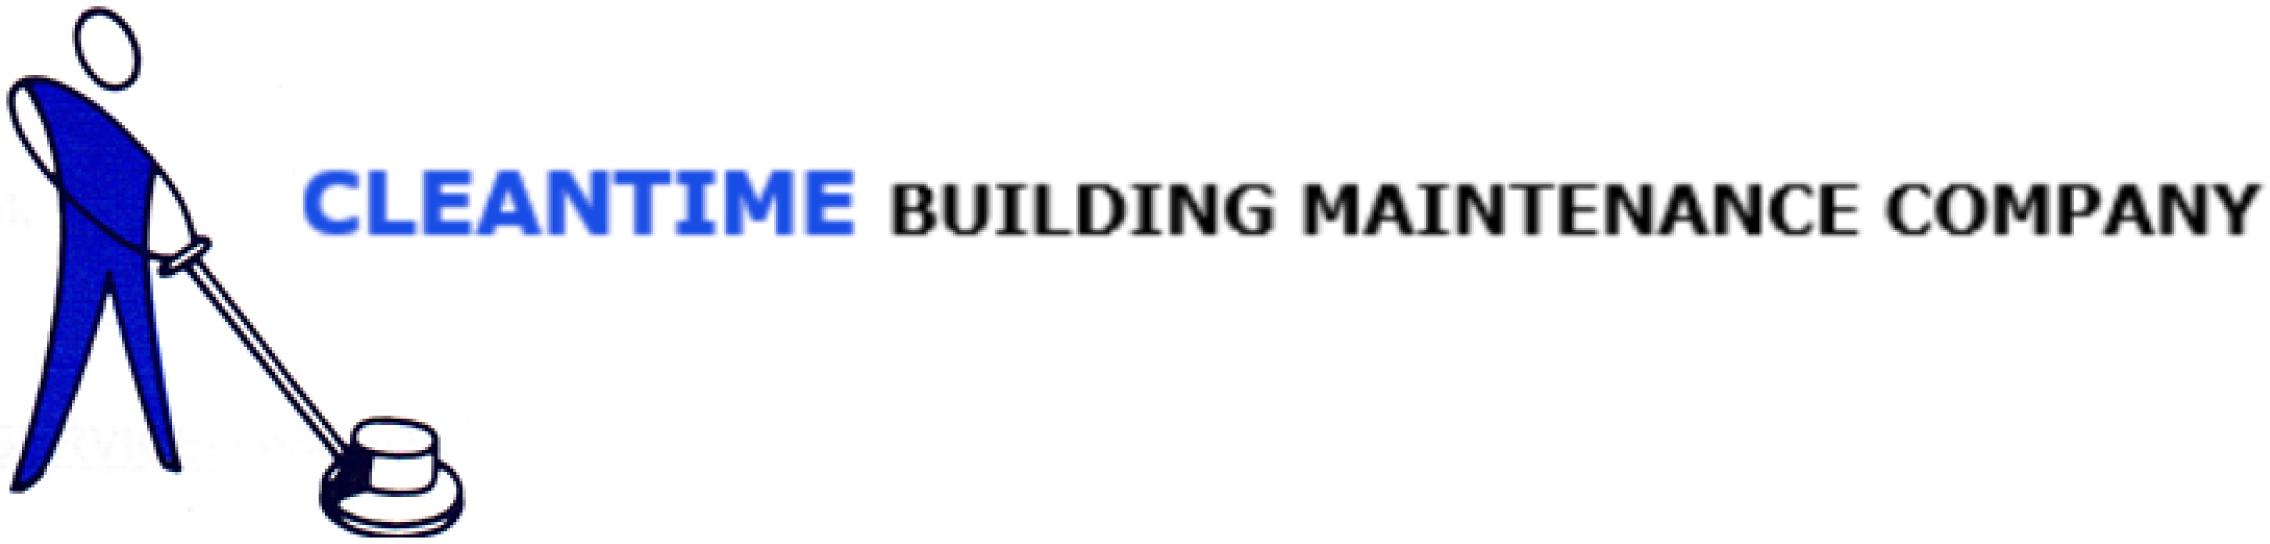 Cleantime Building Maintenance Company